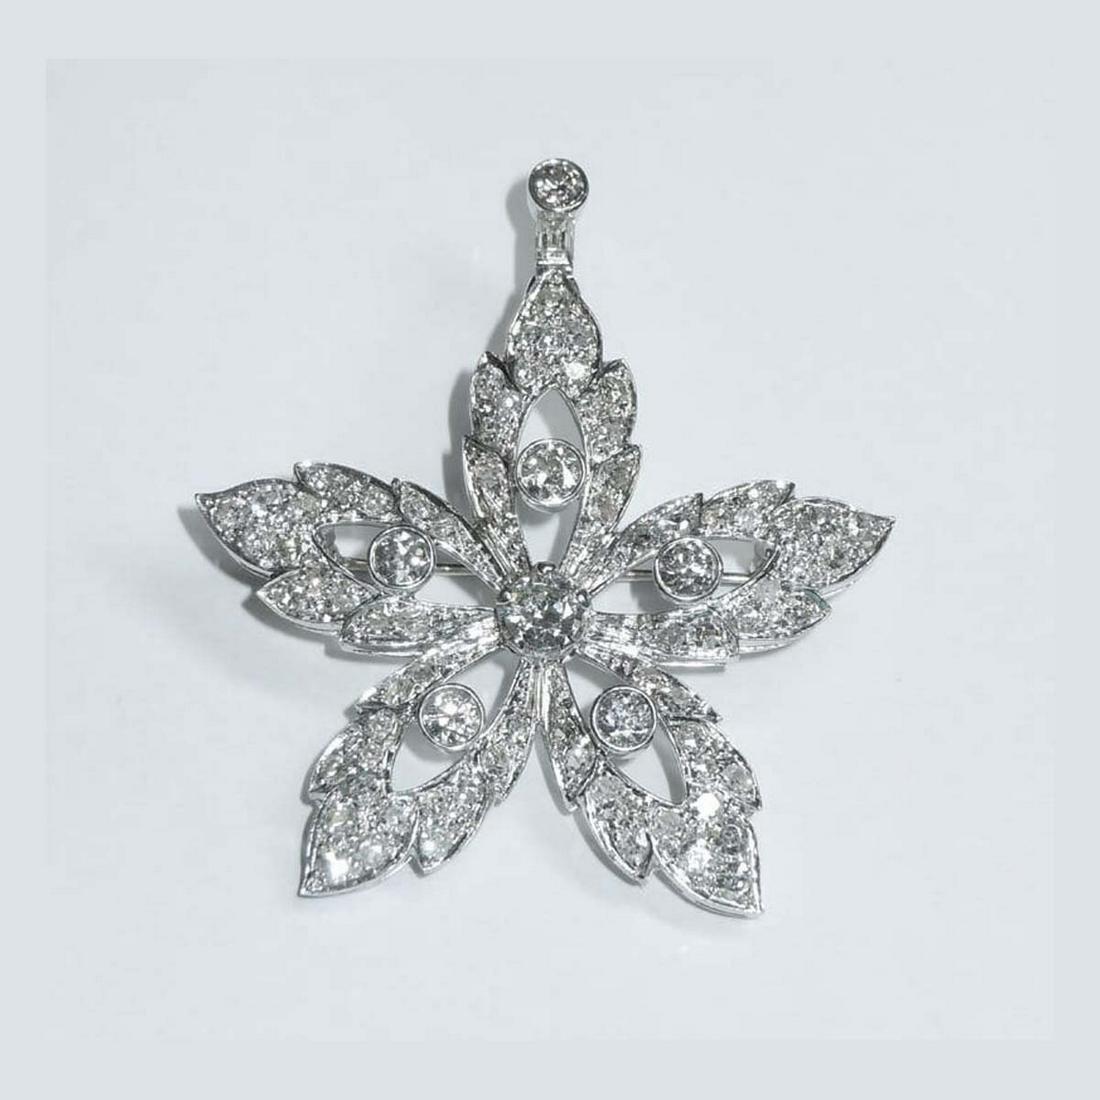 PLATINUM 2ct DIAMOND FLORAL FLOWER PENDANT BROOCH A